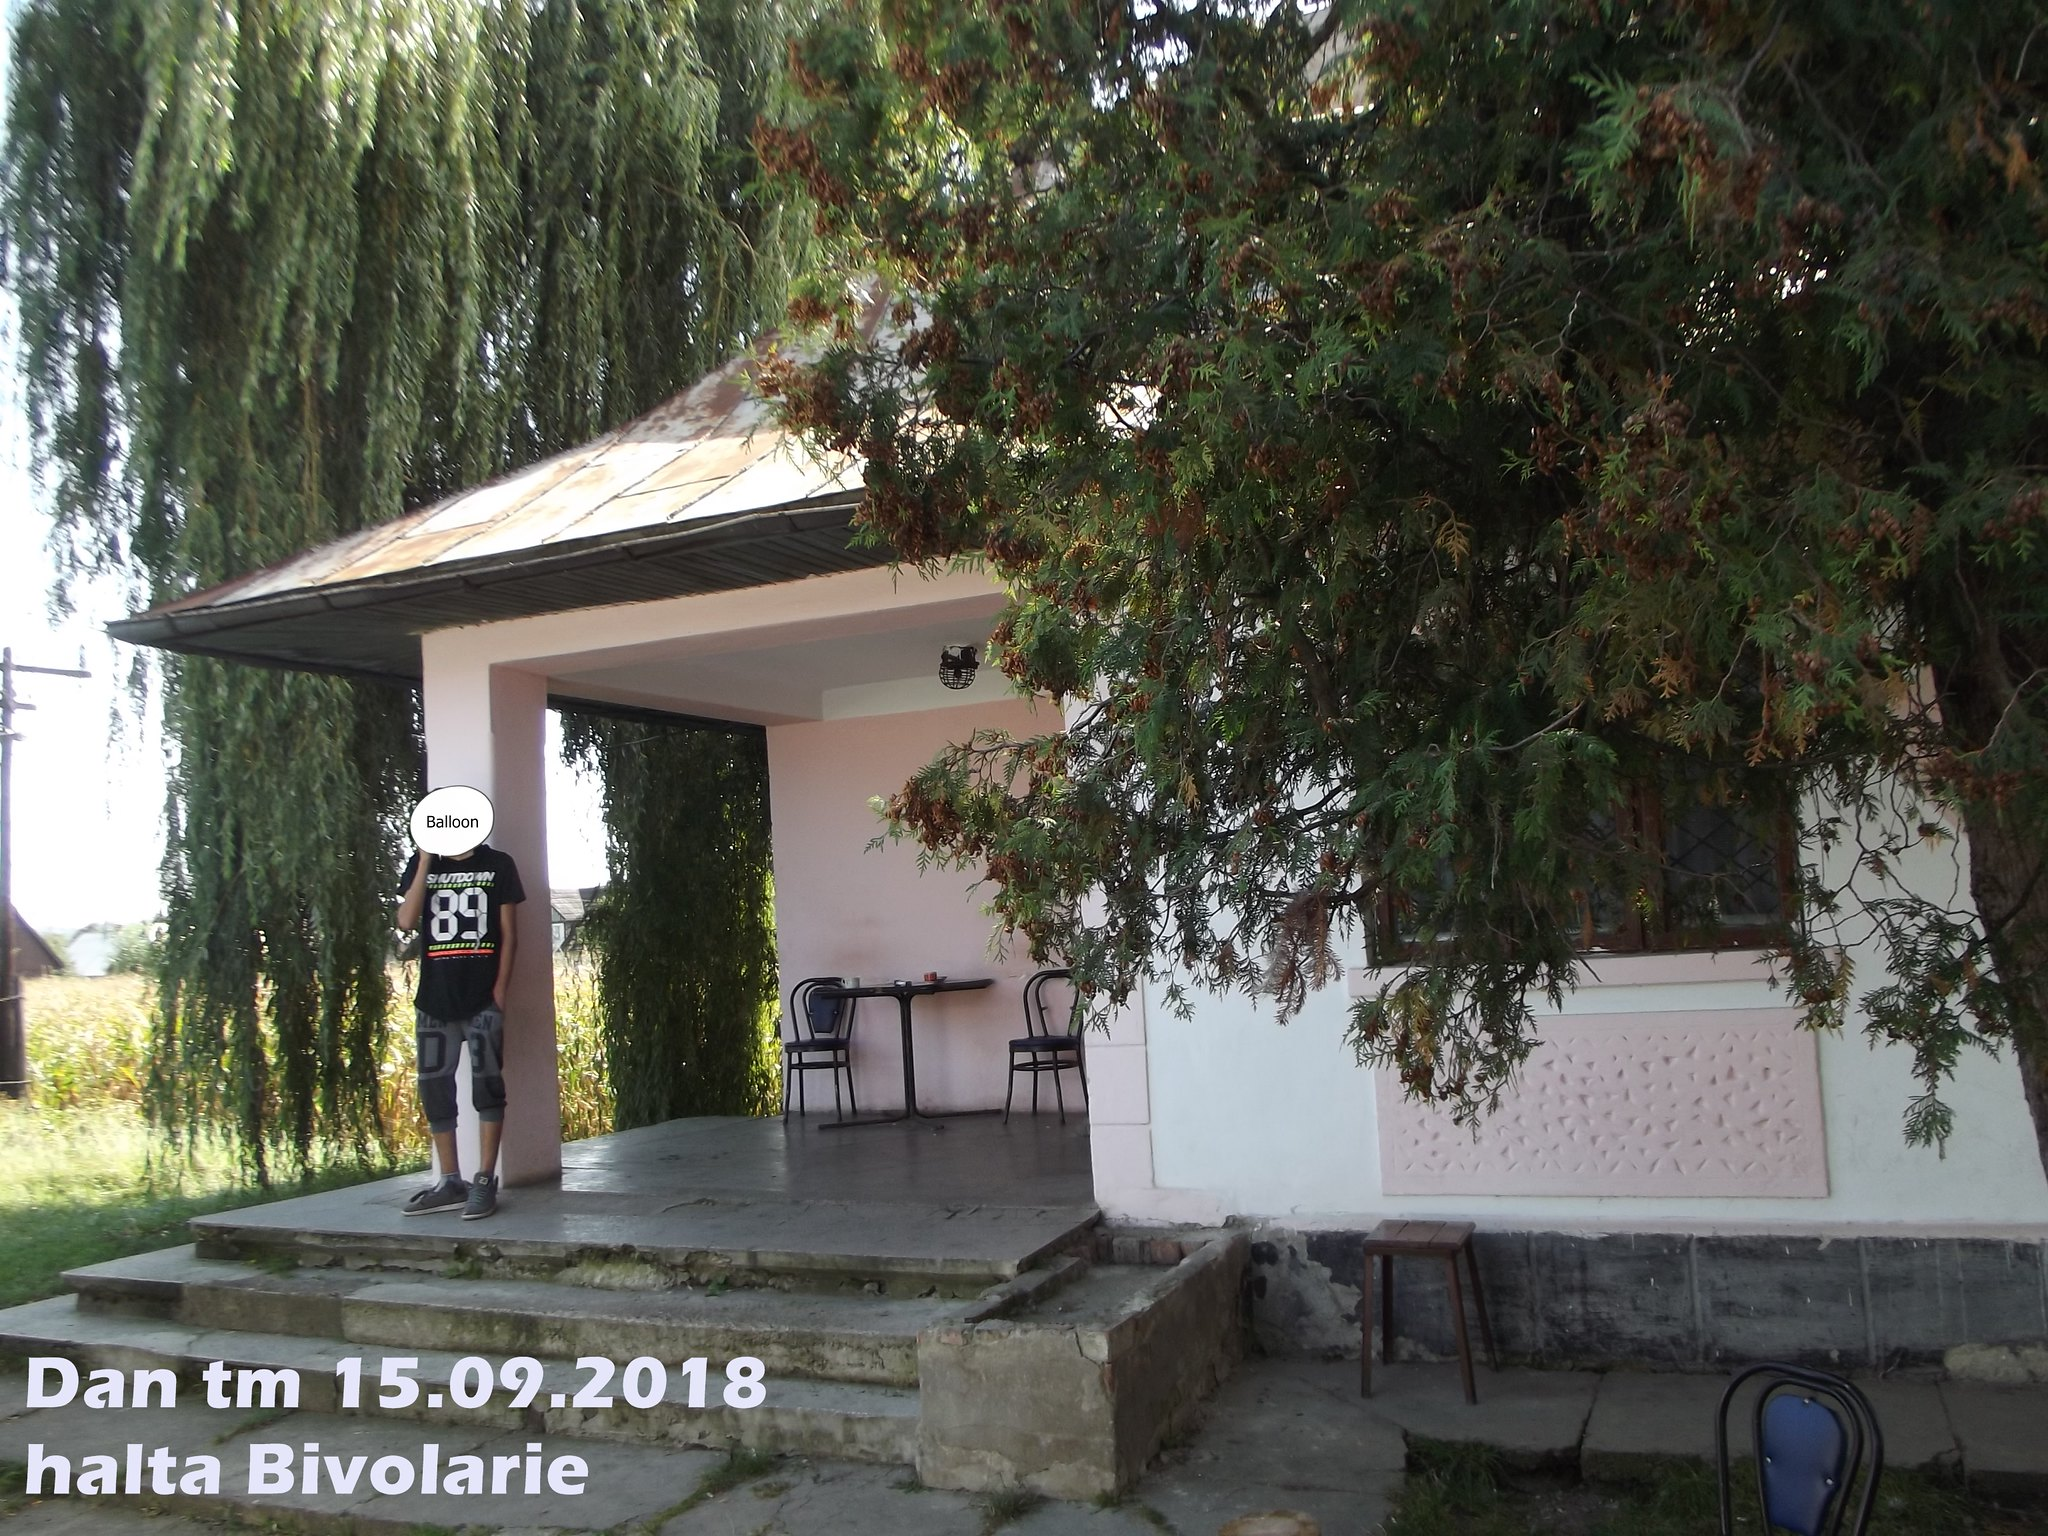 515 : Dorneşti - Gura Putnei - (Putna) - Nisipitu - Seletin UKR - Pagina 47 44016739254_8f333a1413_k